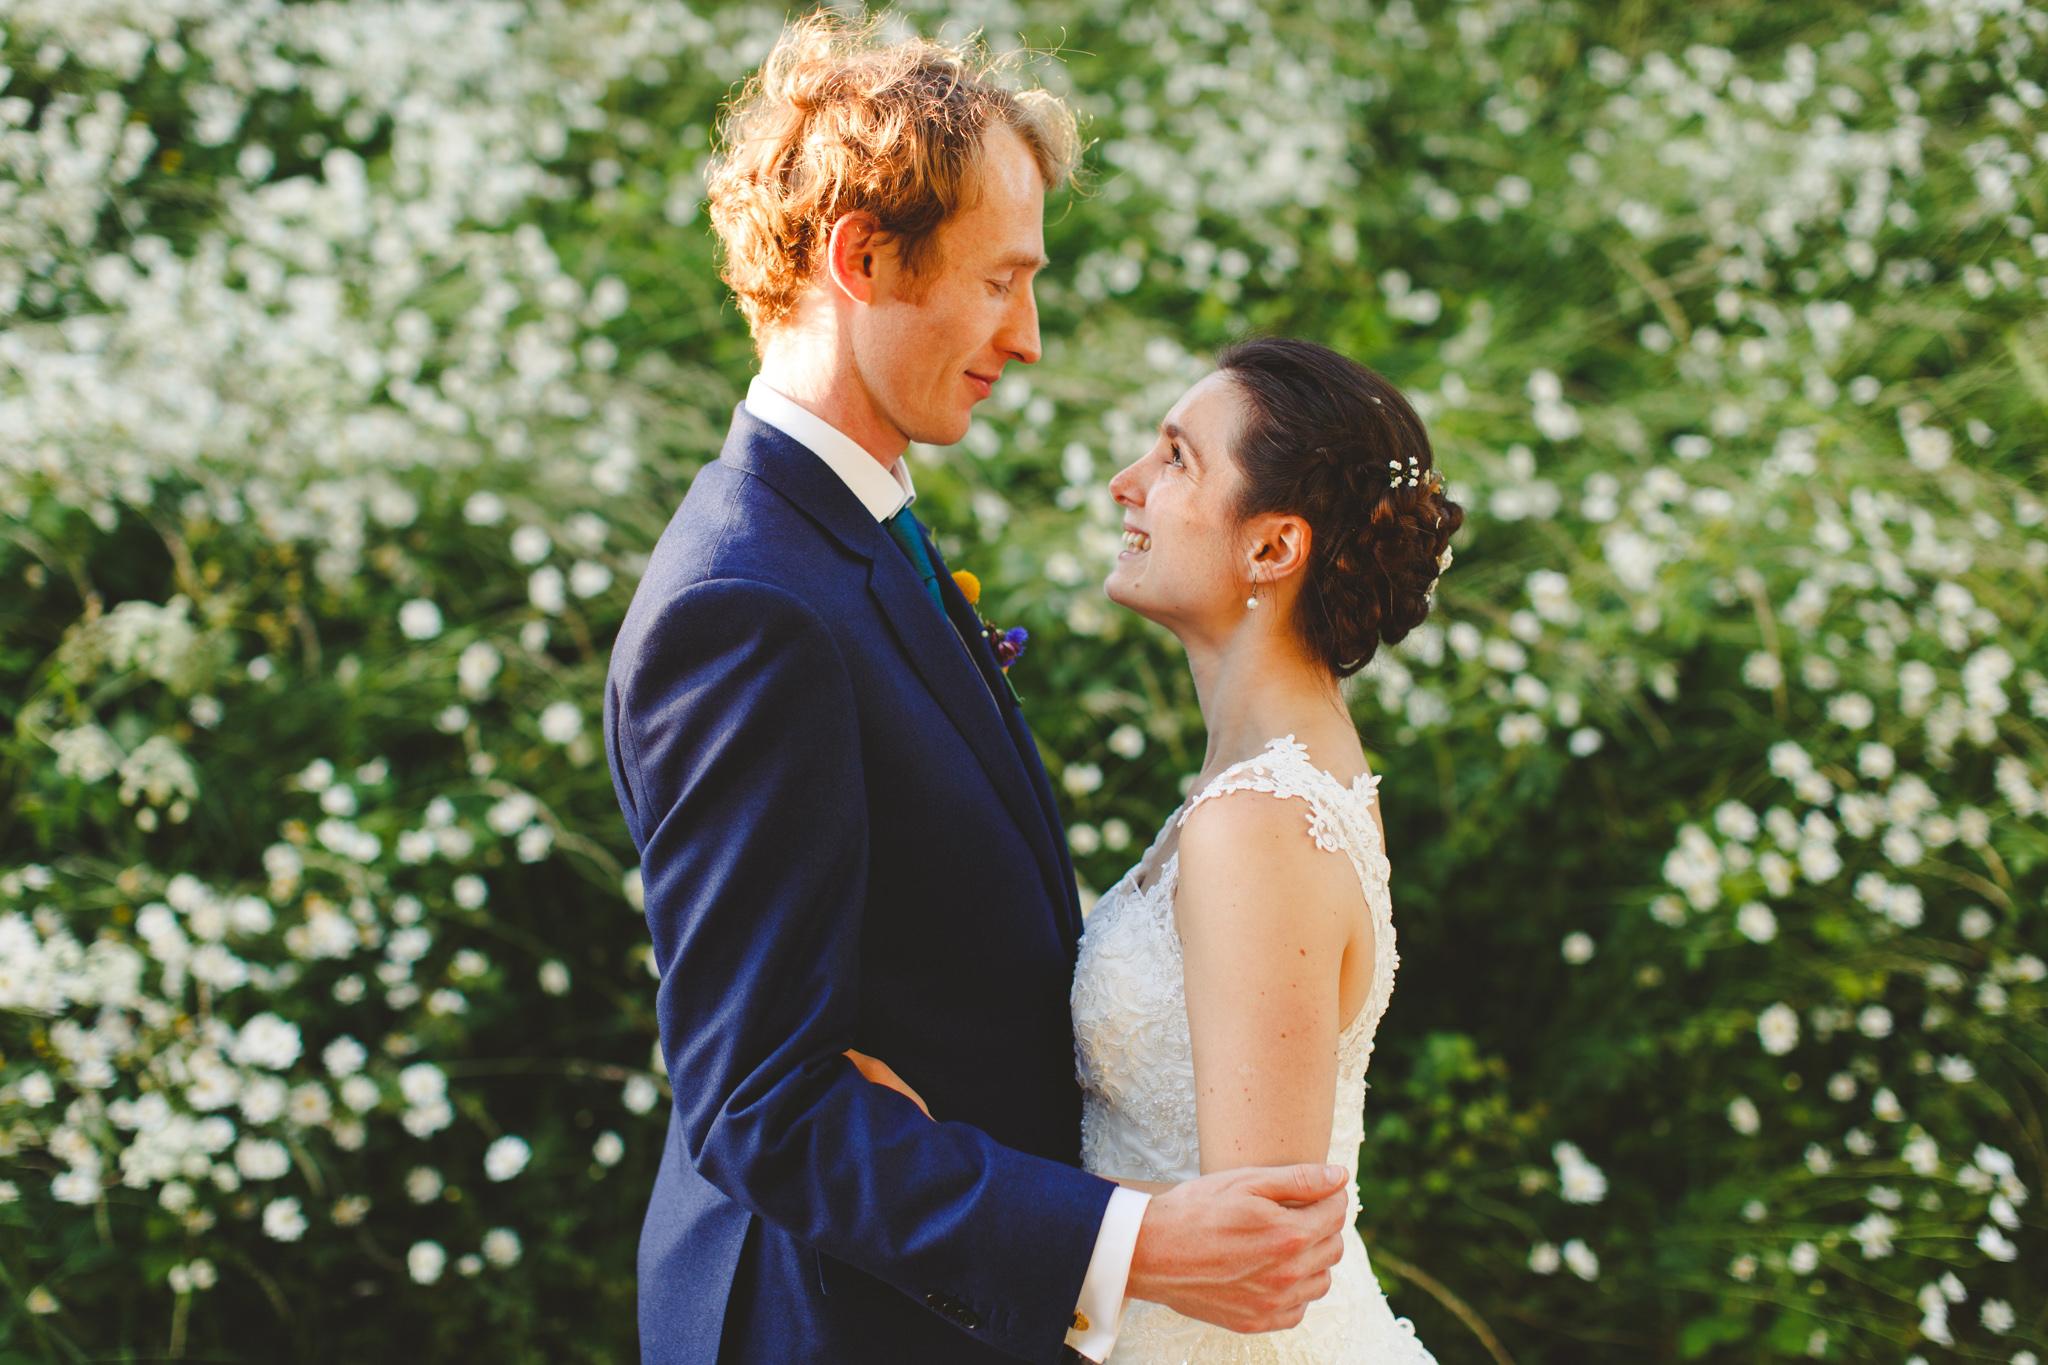 derbyshire-wedding-photographer-videographer-camera-hannah-20.jpg